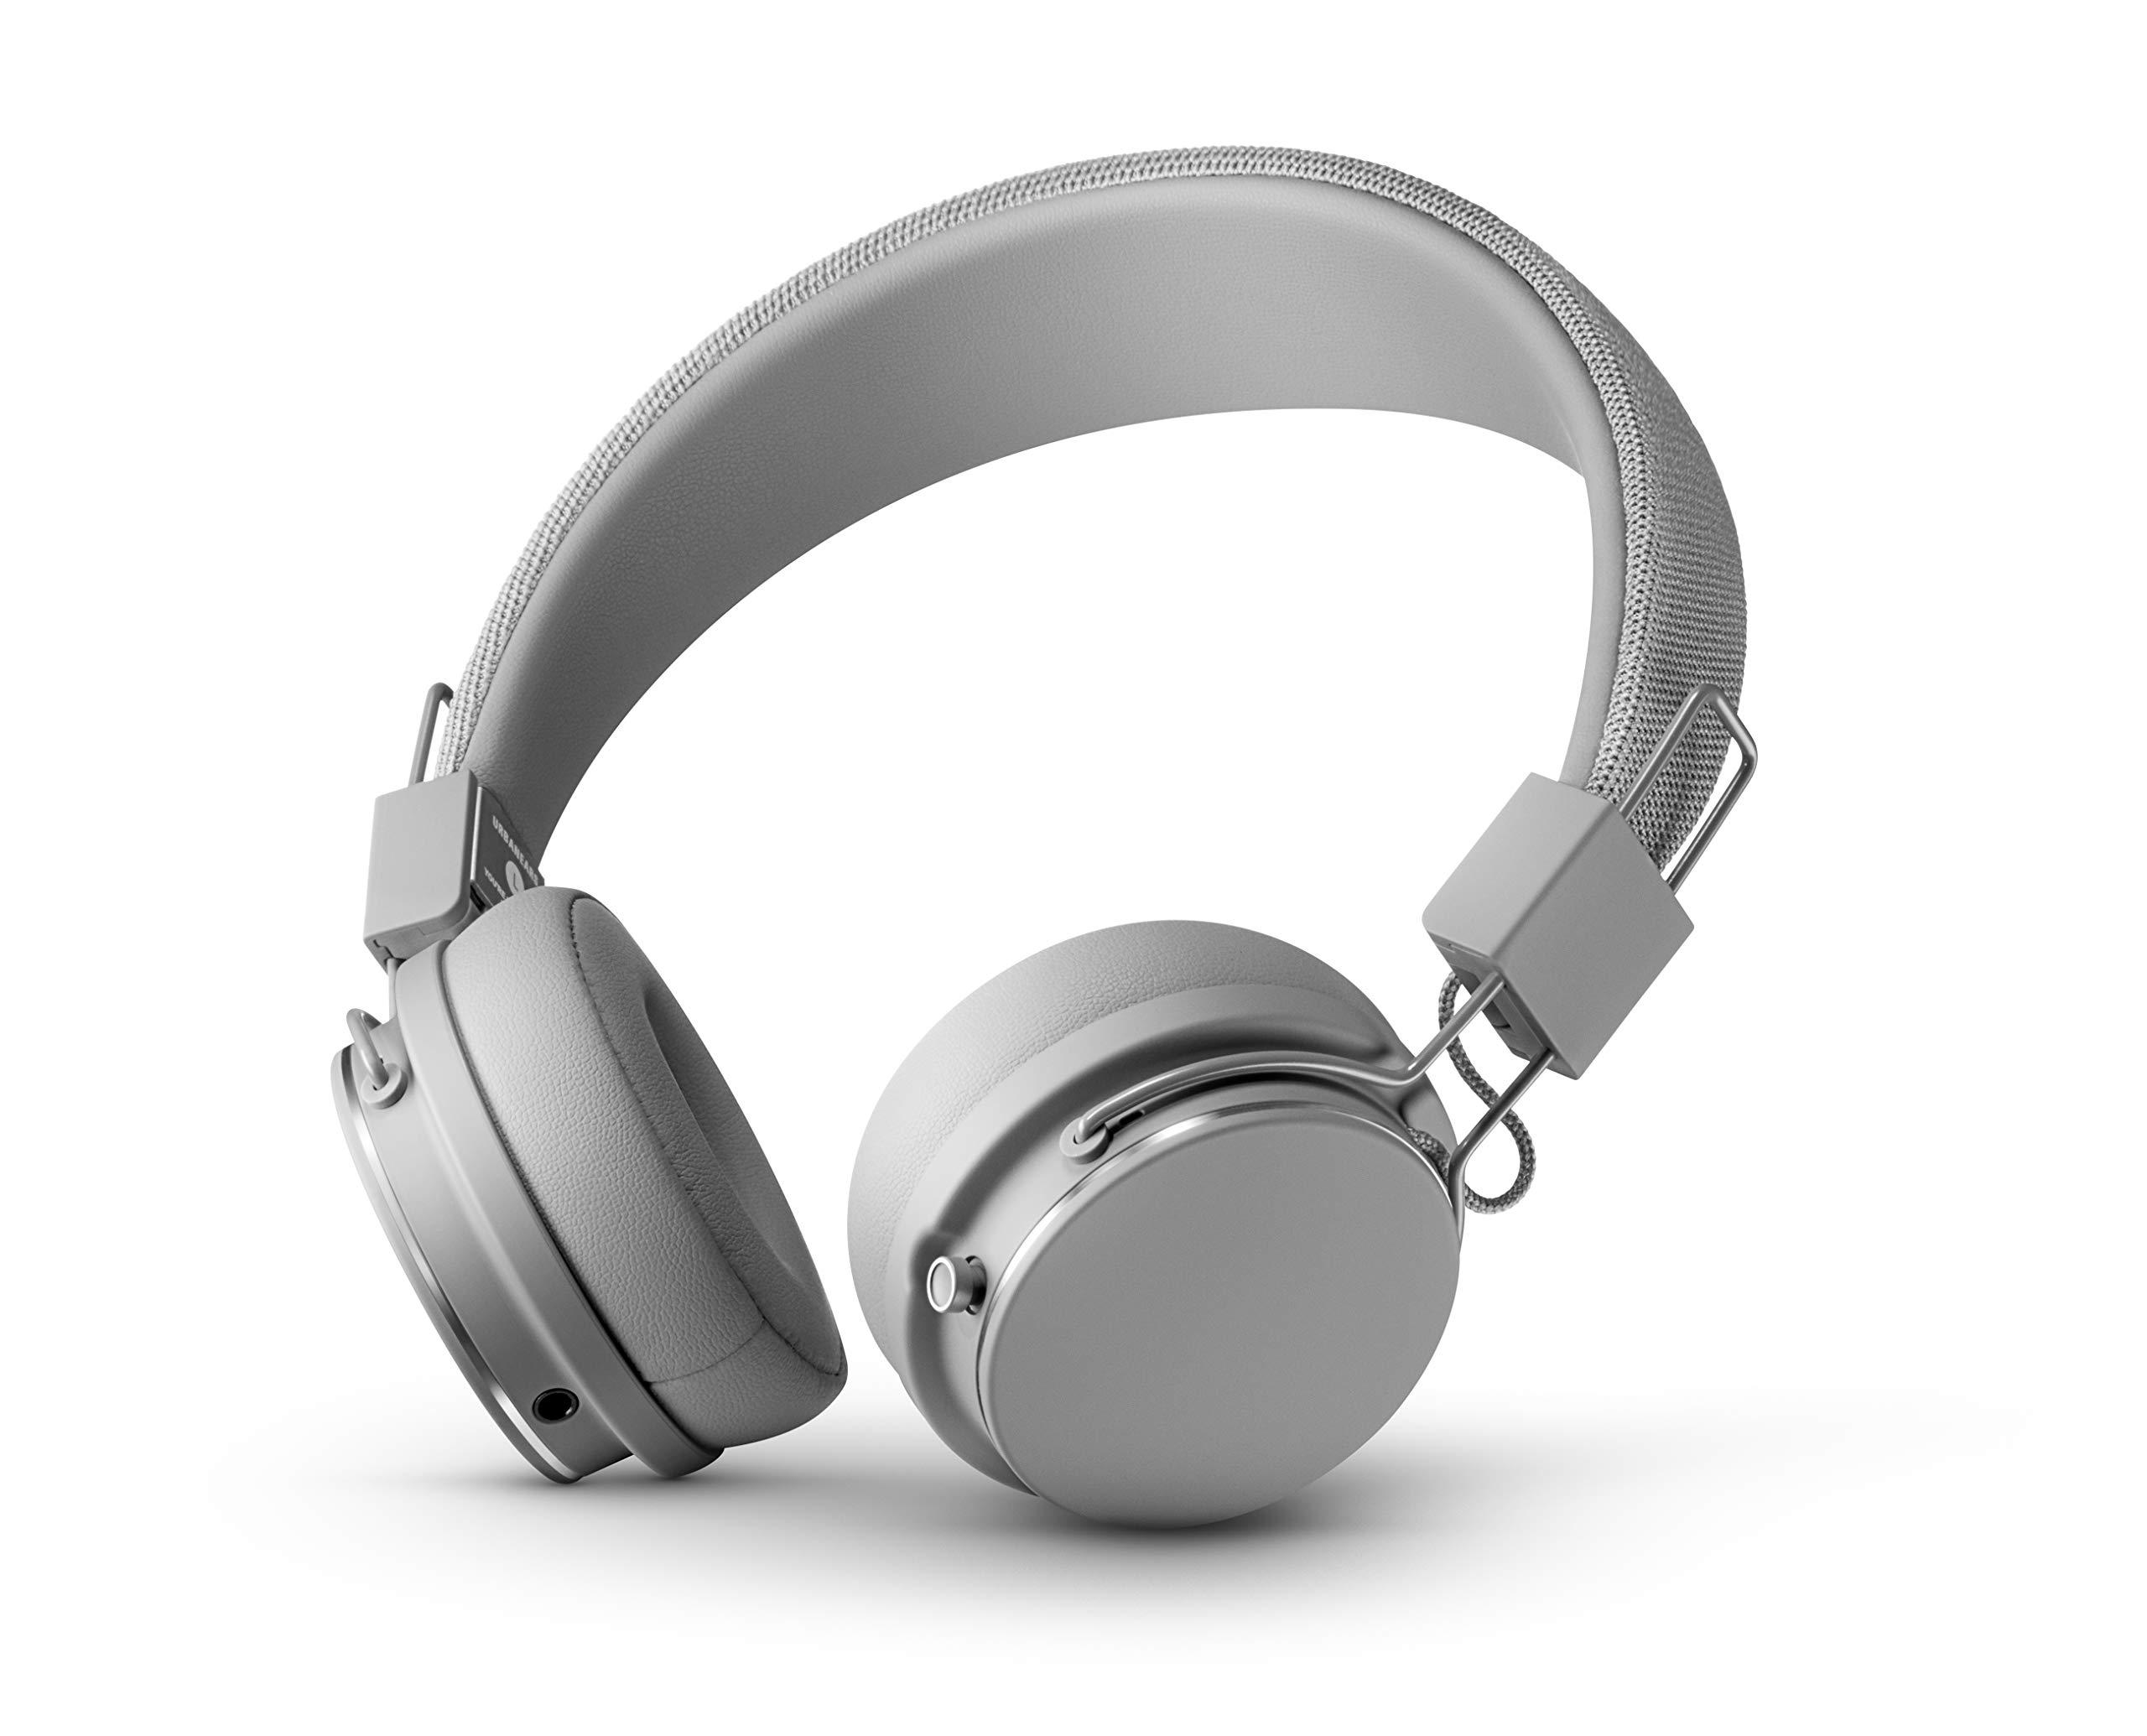 Urbanears Plattan 2 Bluetooth On-ear Los Auriculares Gris Oscuro (04092111)